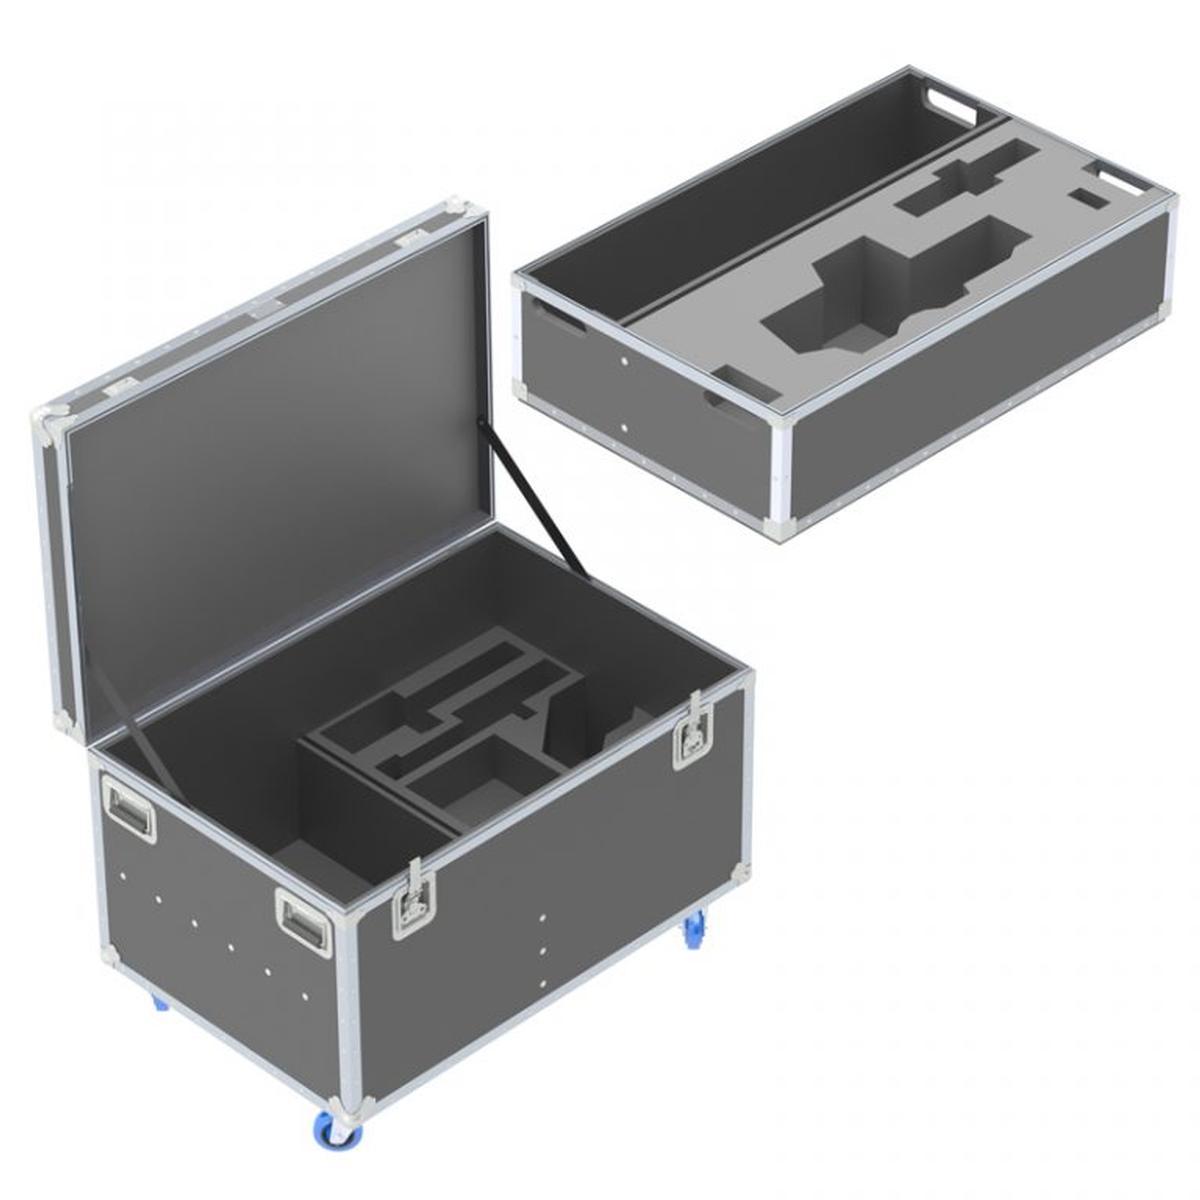 39 2684 Custom Ata 300 Shipping Case For Pro Lighting